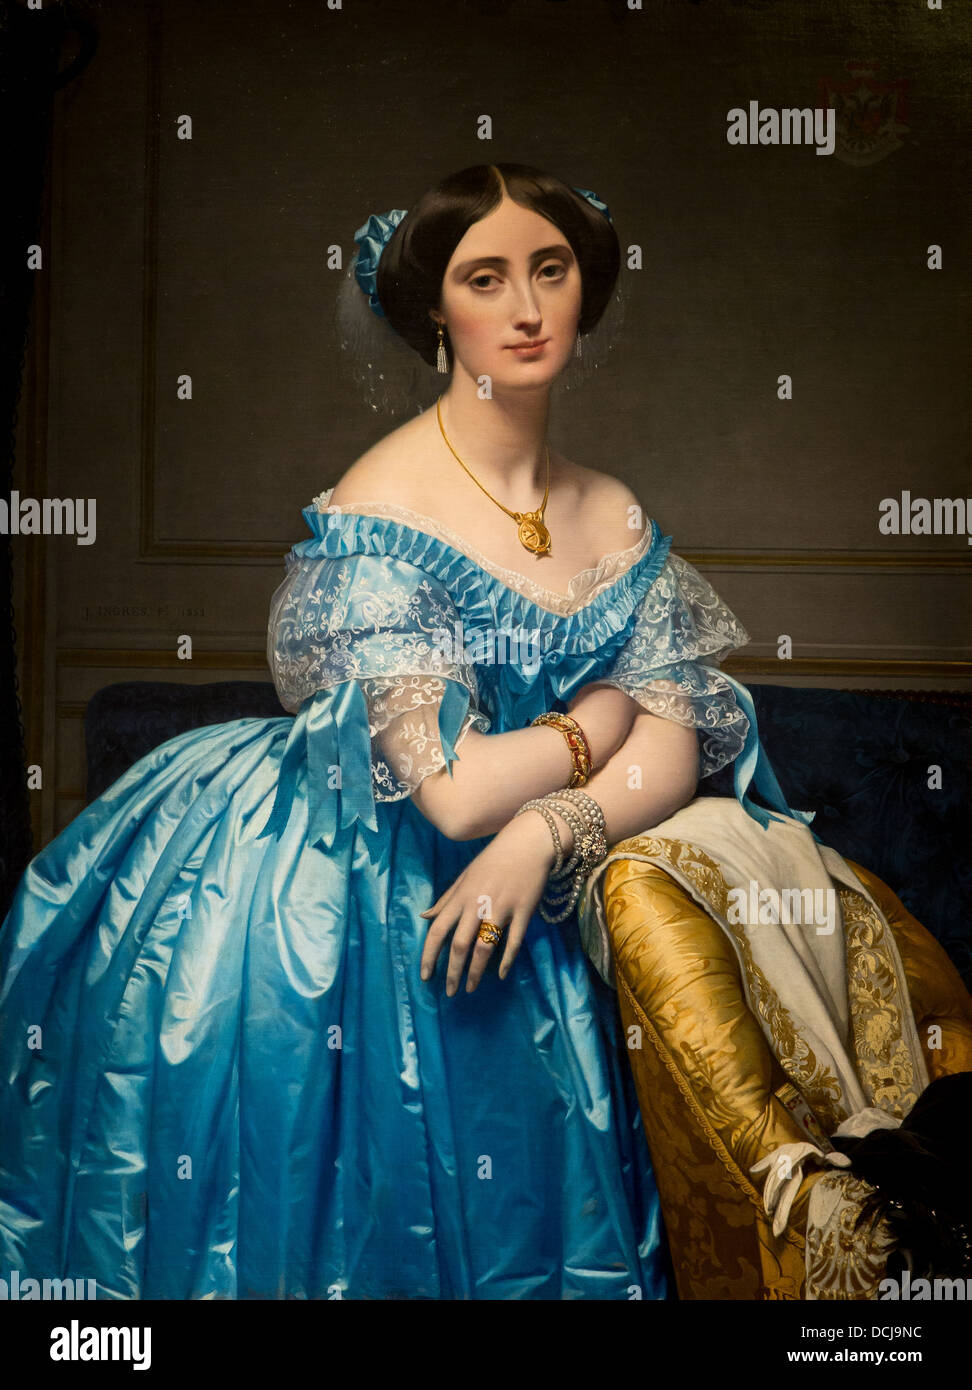 19th century  -  Princesse of Broglie - Jean-Auguste-Dominique Ingres (1851) Oil on canvas - Stock Image